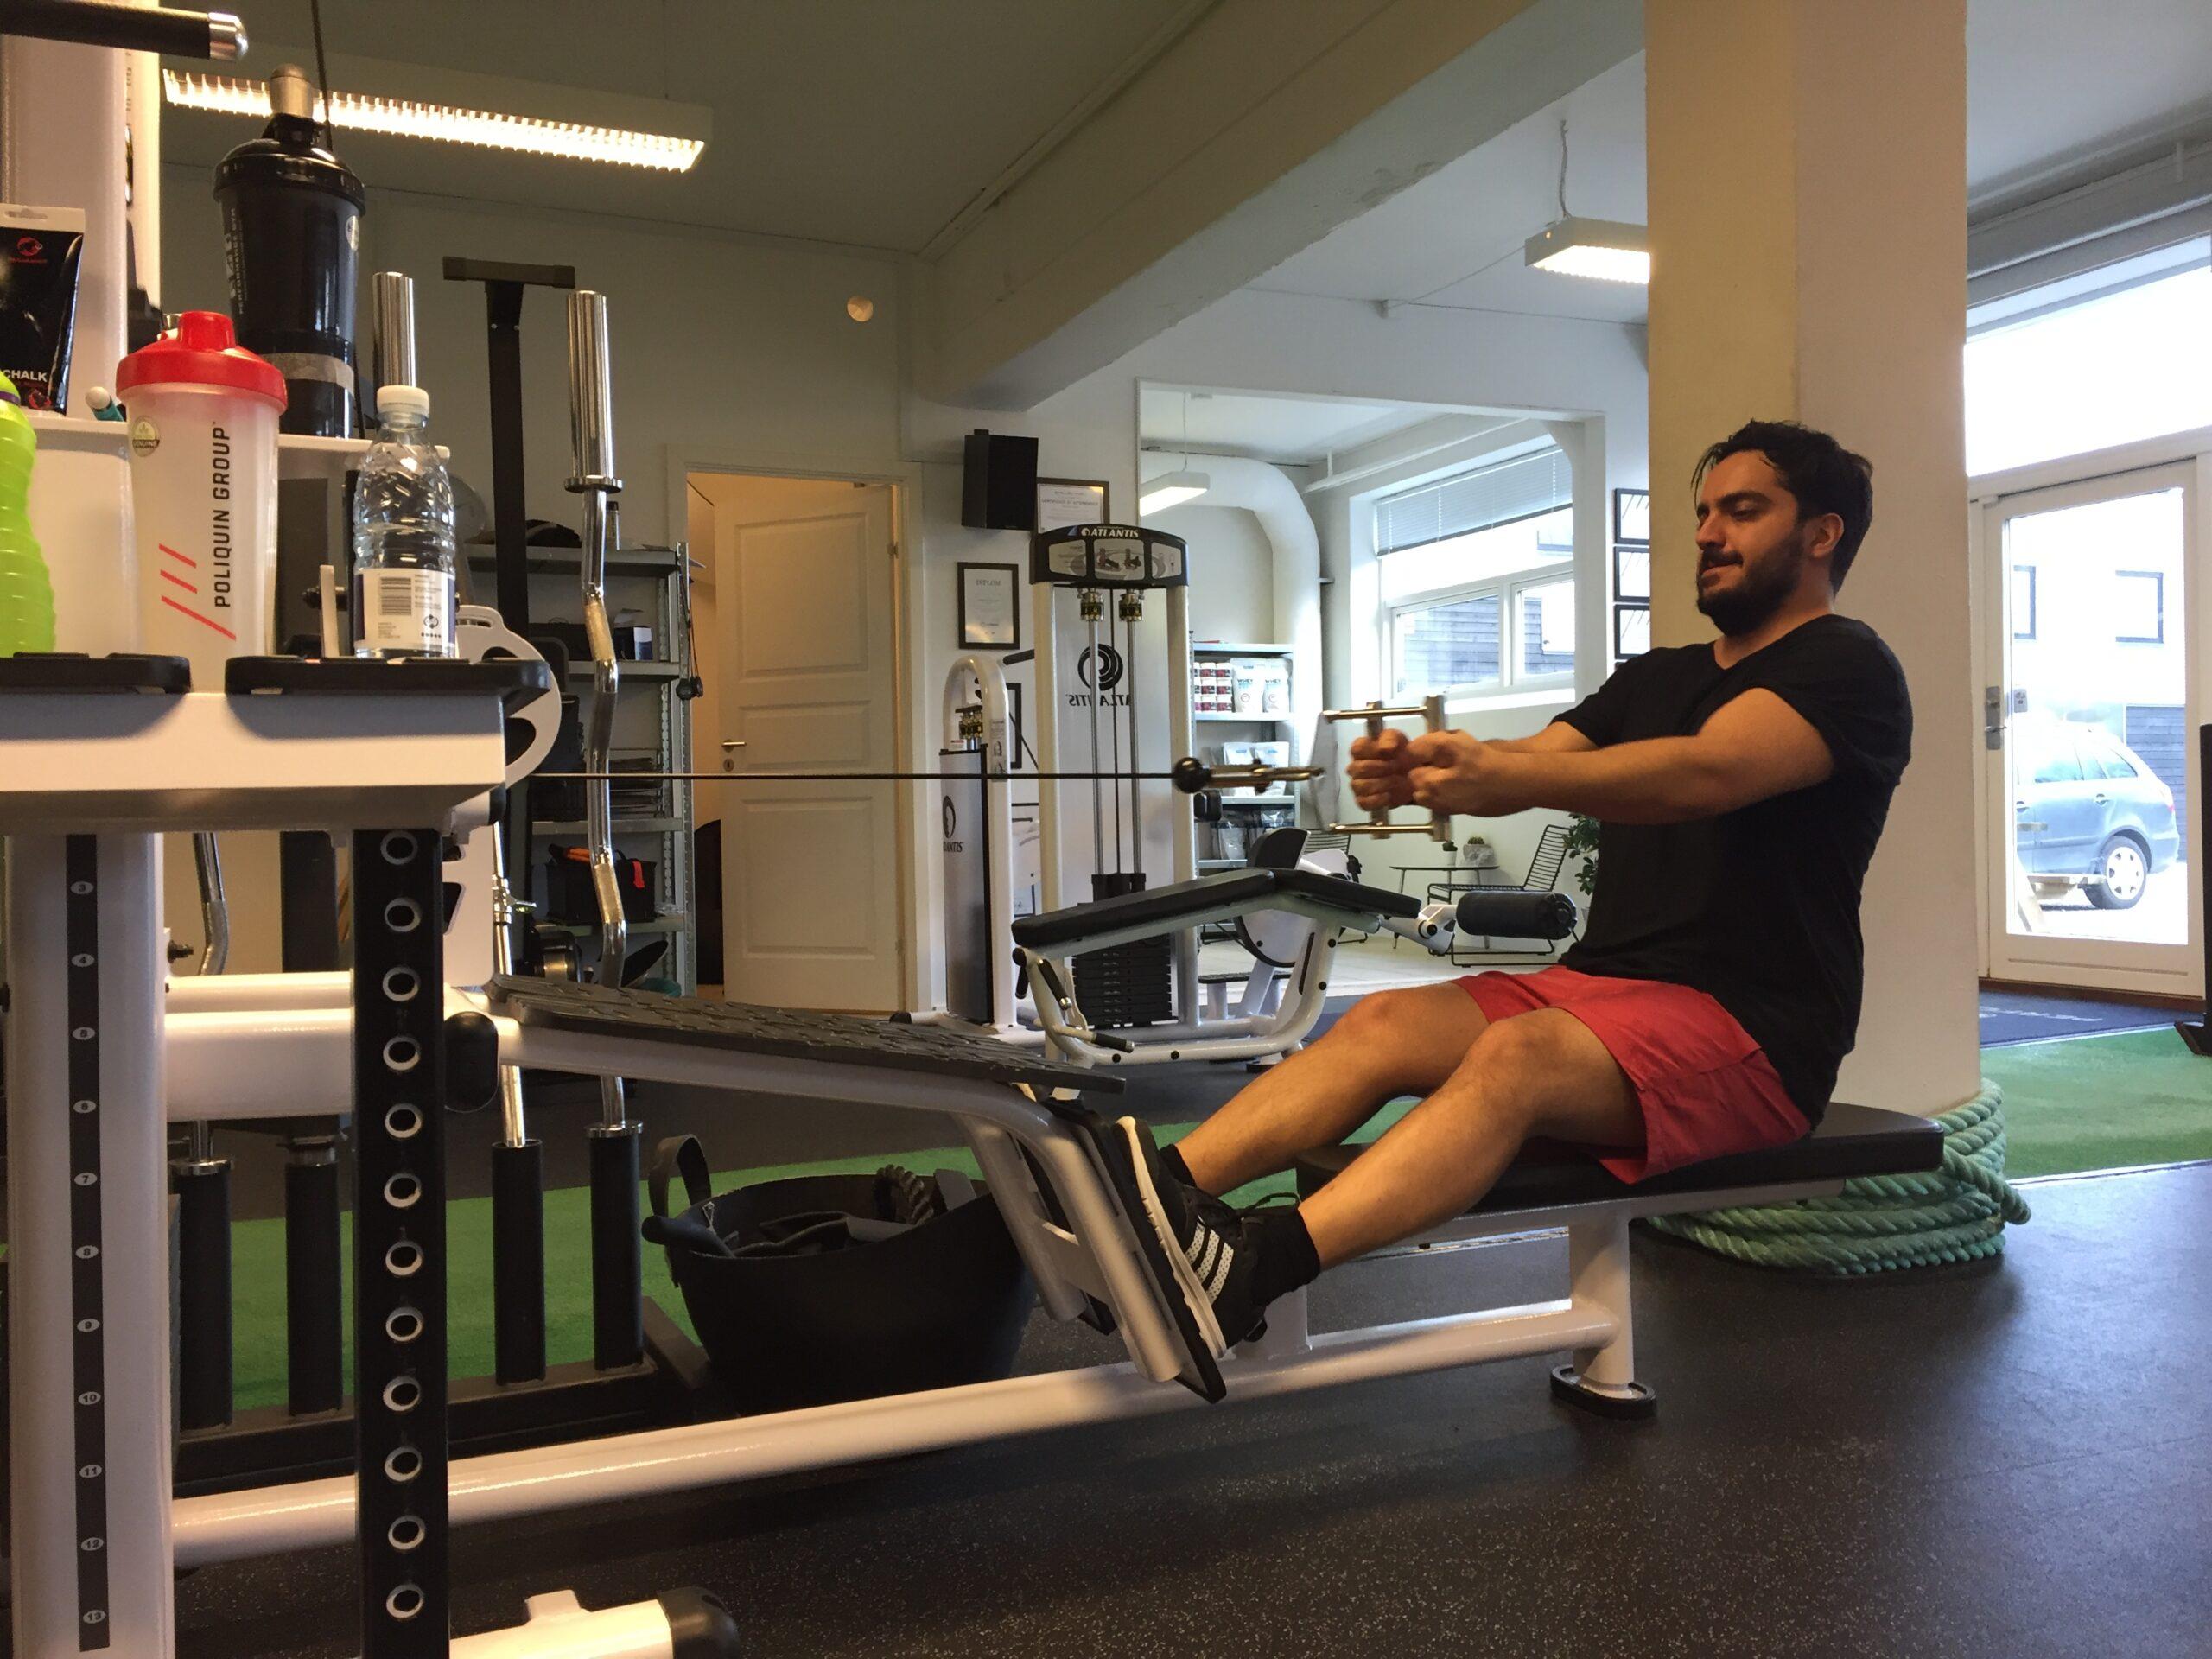 Praktisk Onsdag – Program for fedttab – Torso+Arme